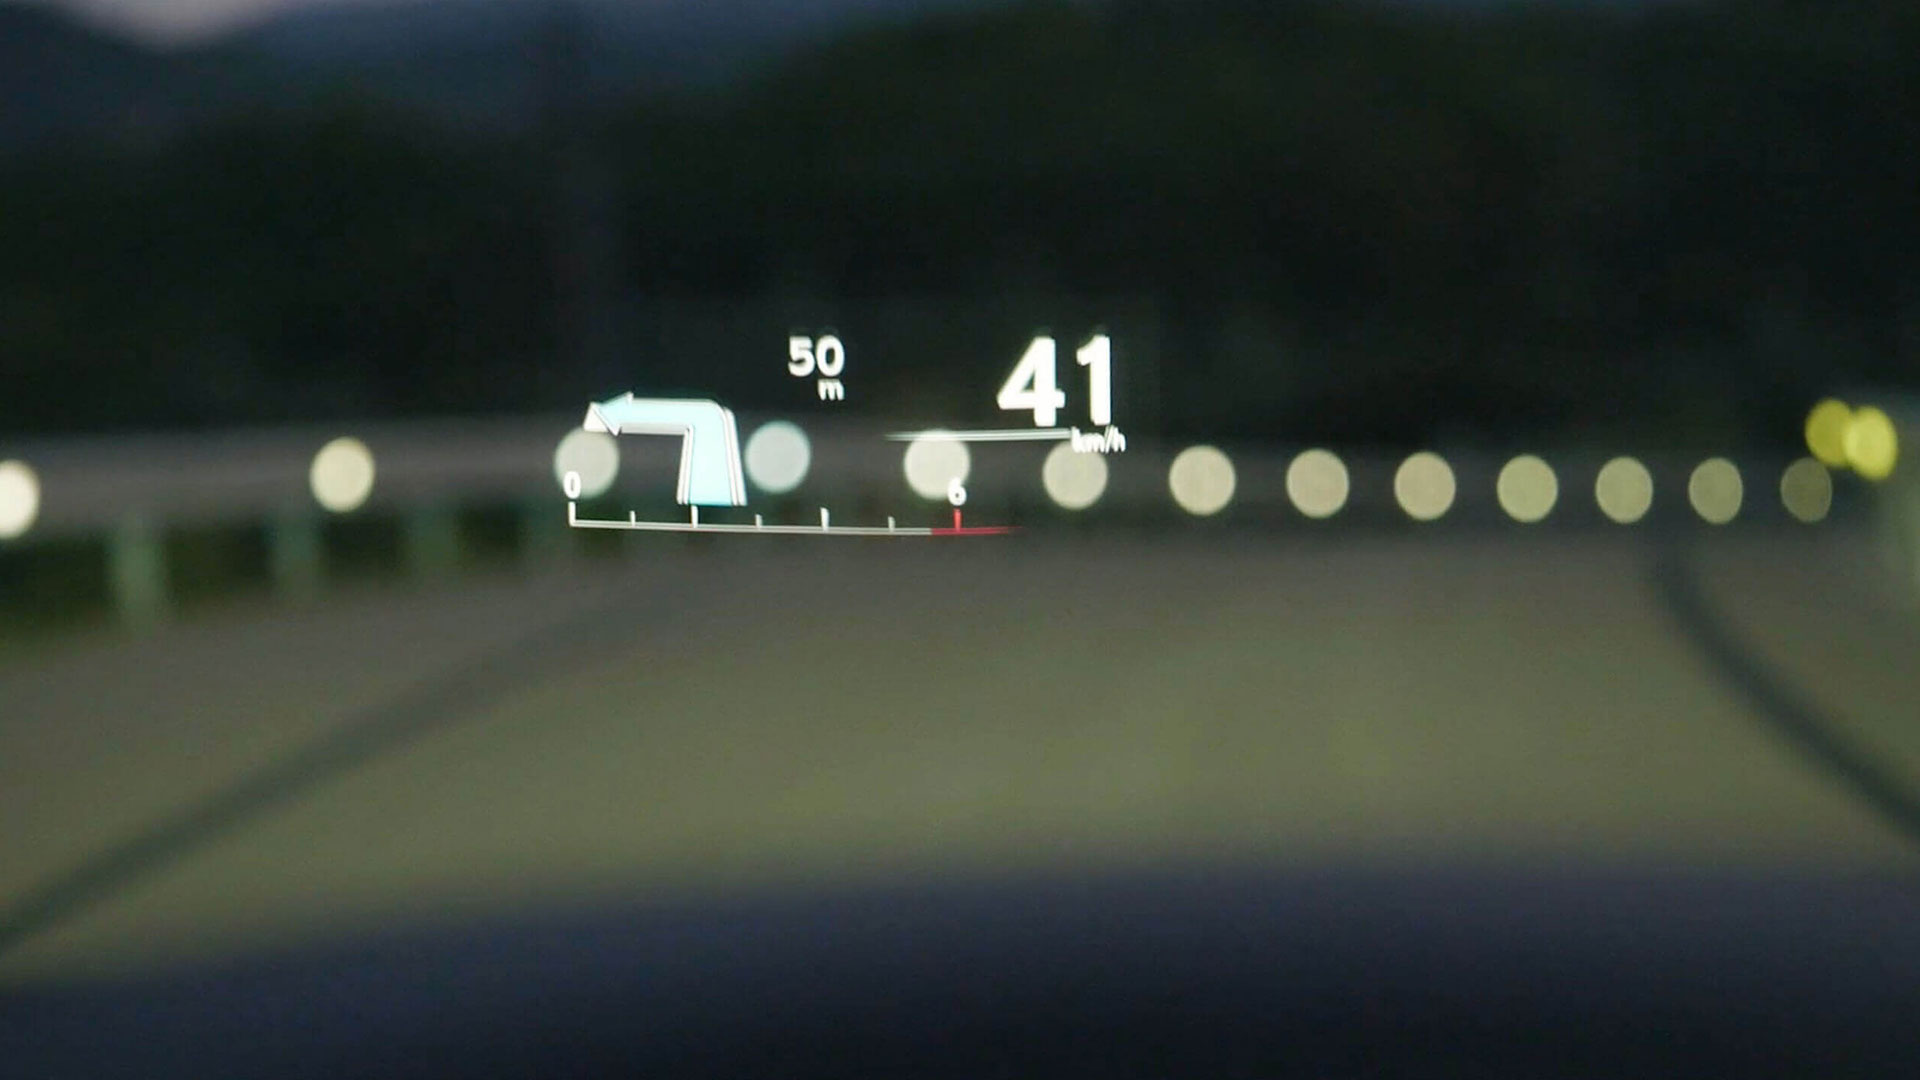 10 Adaptive high beam image